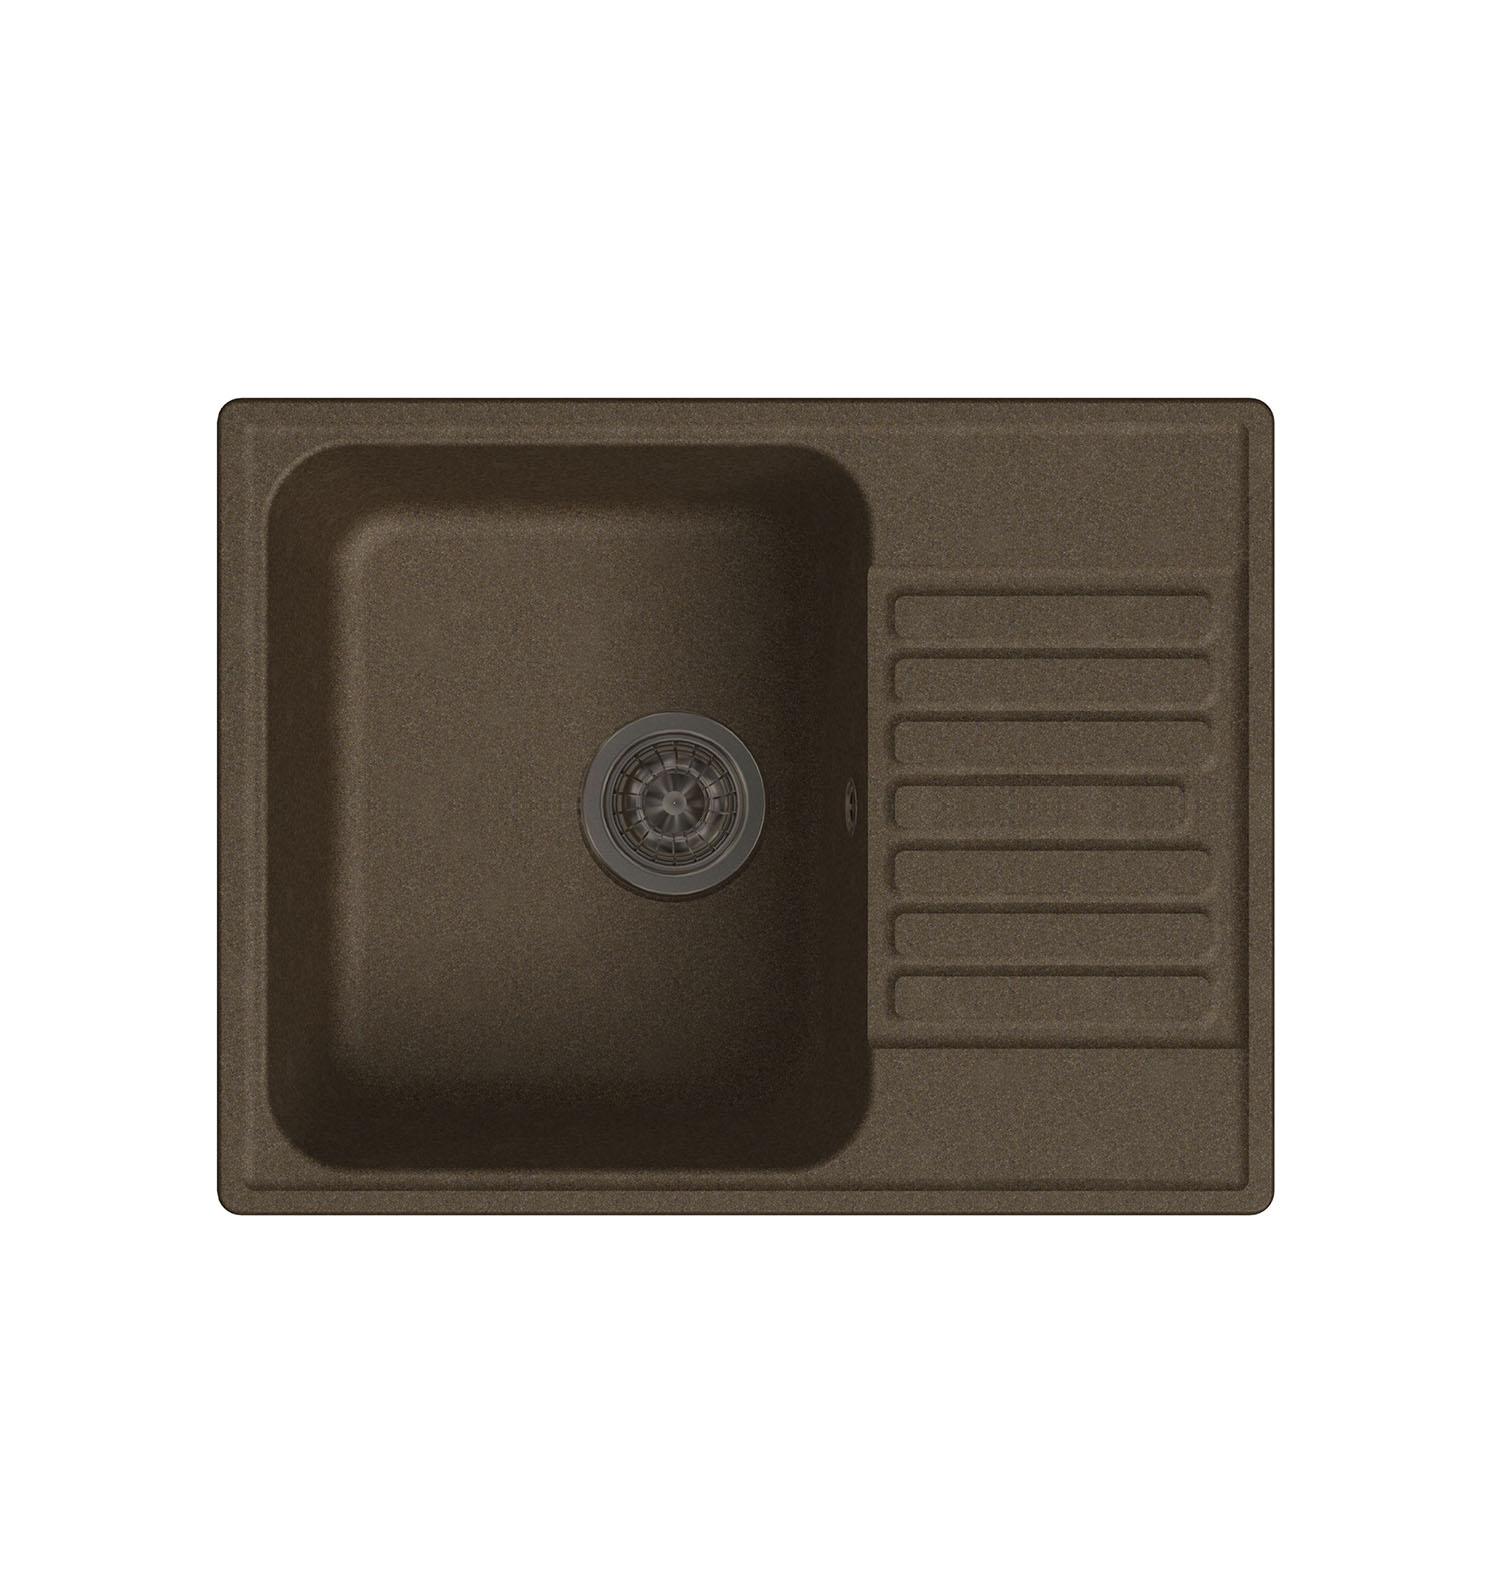 LEX Garda 620 Chocolate кухонная мойка lex garda 620 black черный